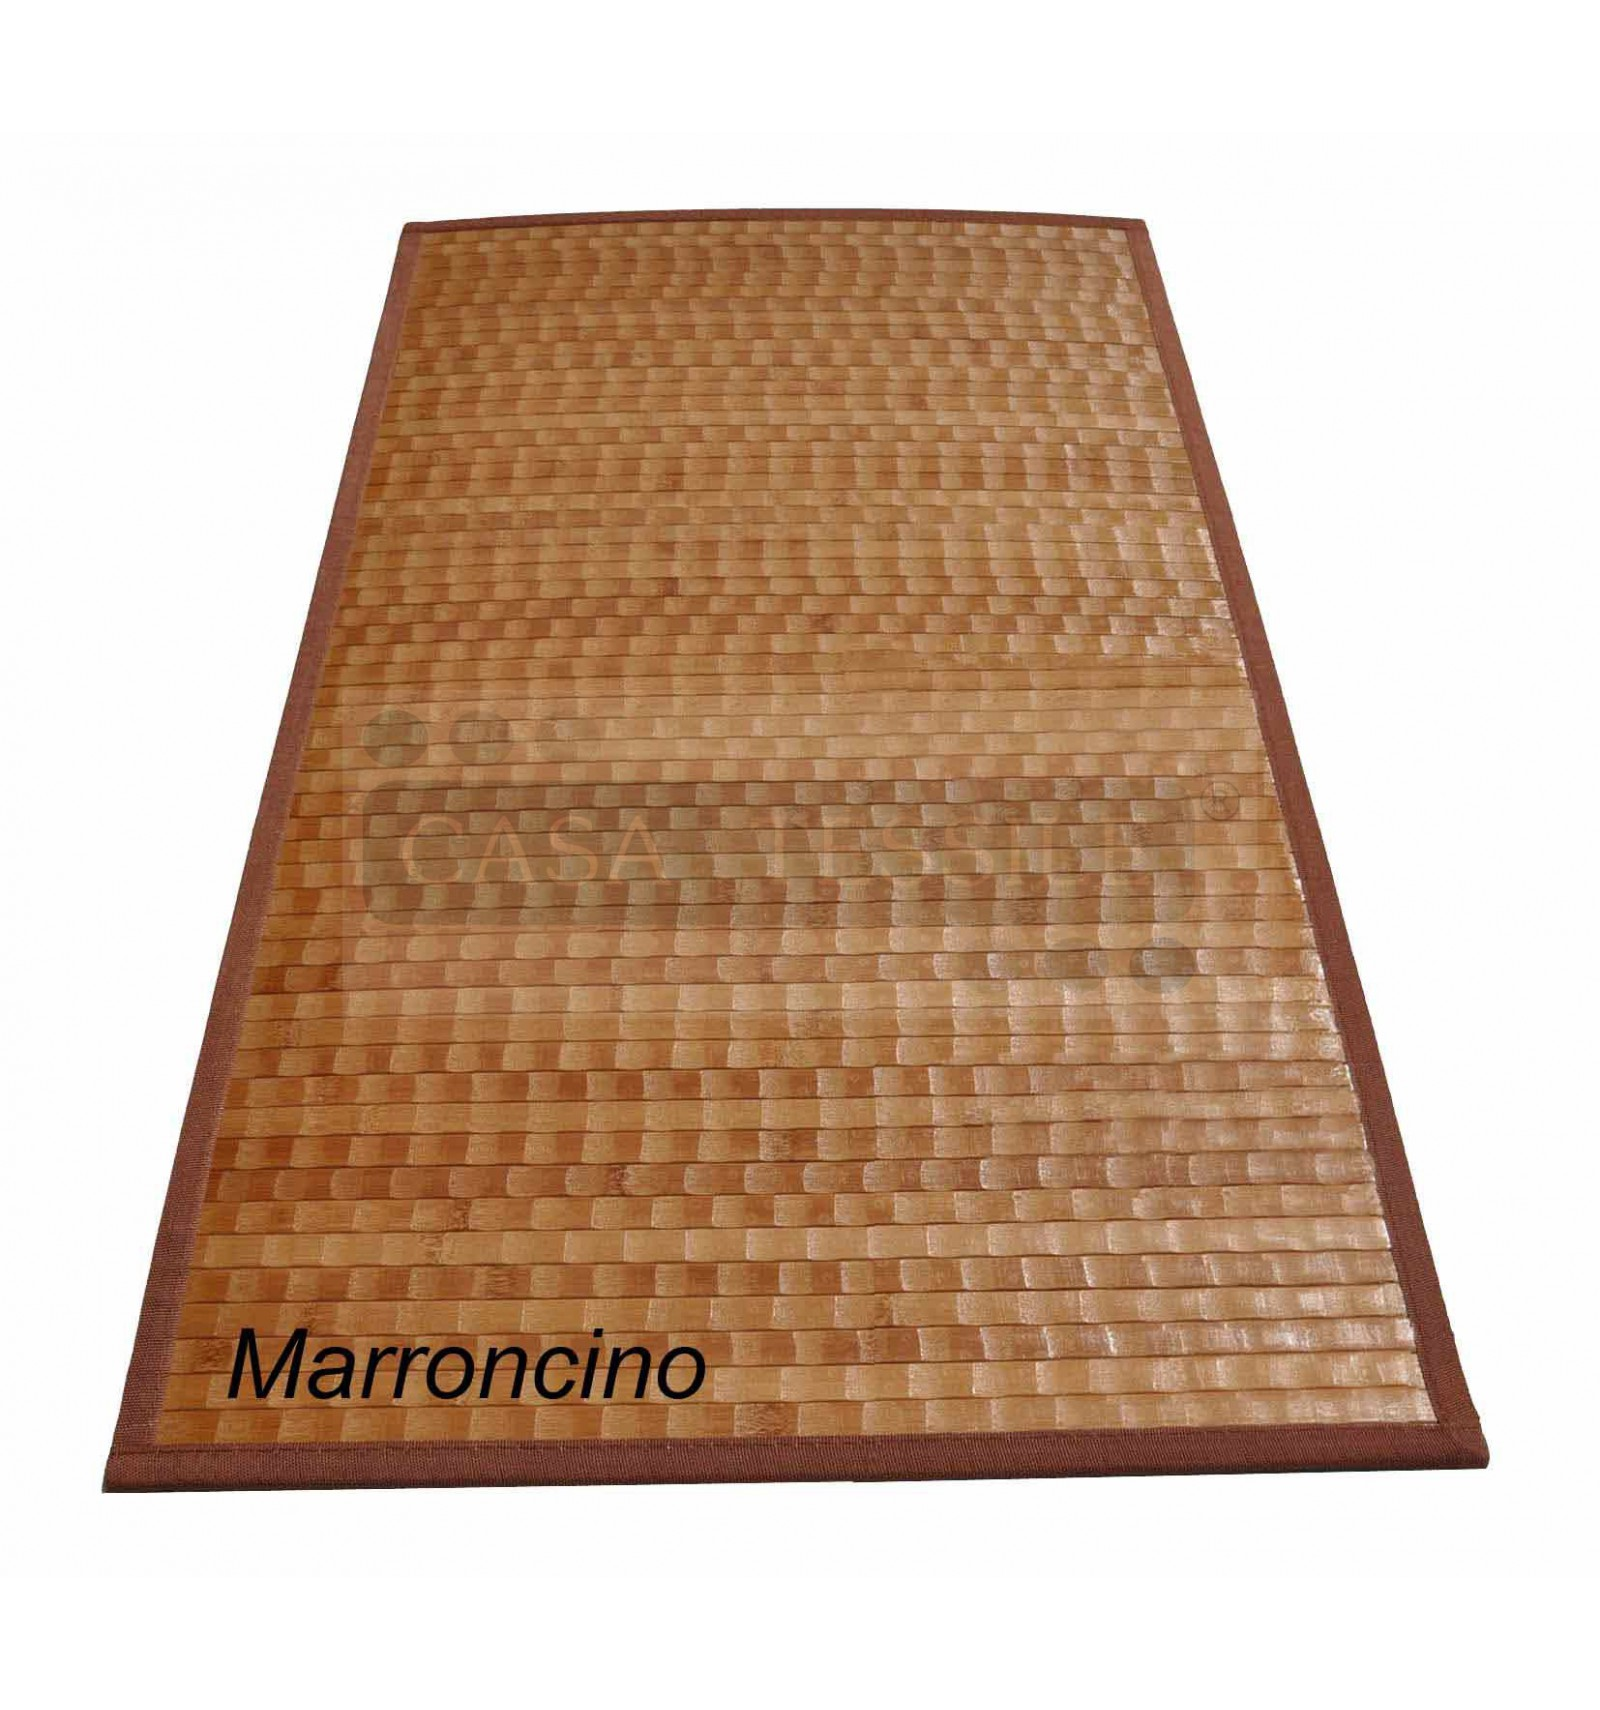 Bamboo tamburato tappeto passatoia cm 160x230 casatessile - Tappeto 160x230 ...